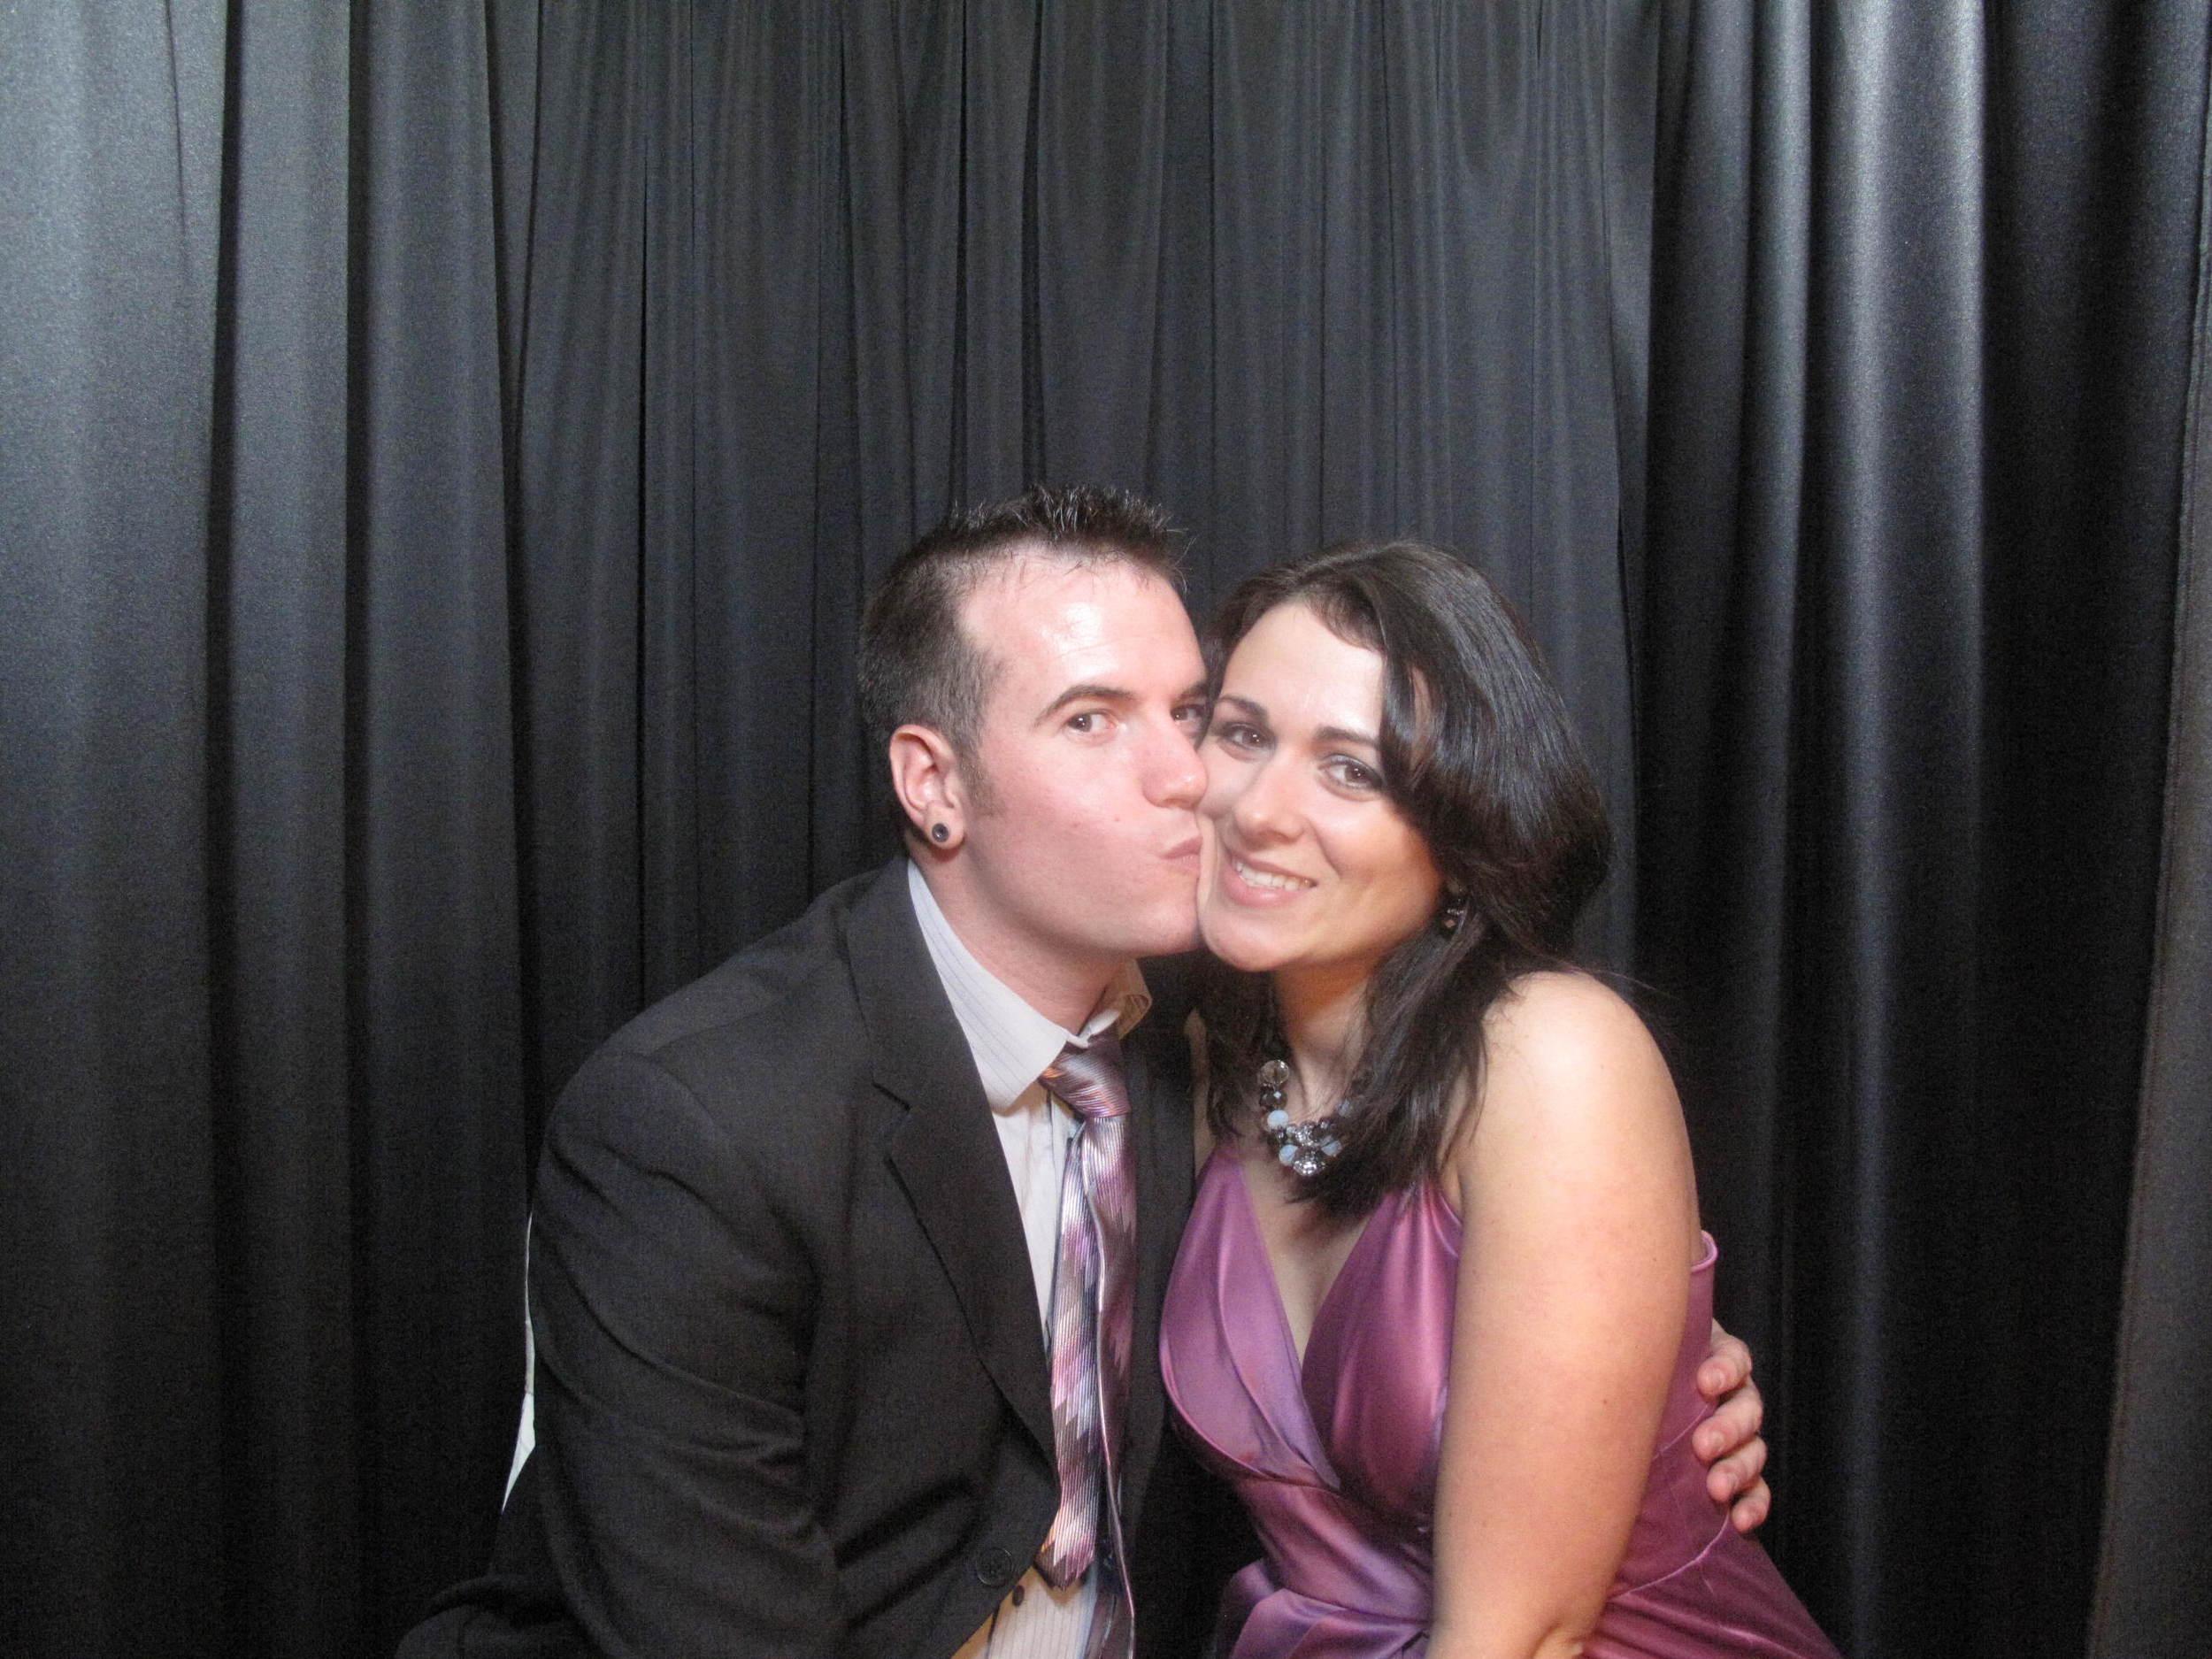 0081Snapshot Photobooths at the Versailles Ballroom at the Ramada Inn in Toms River